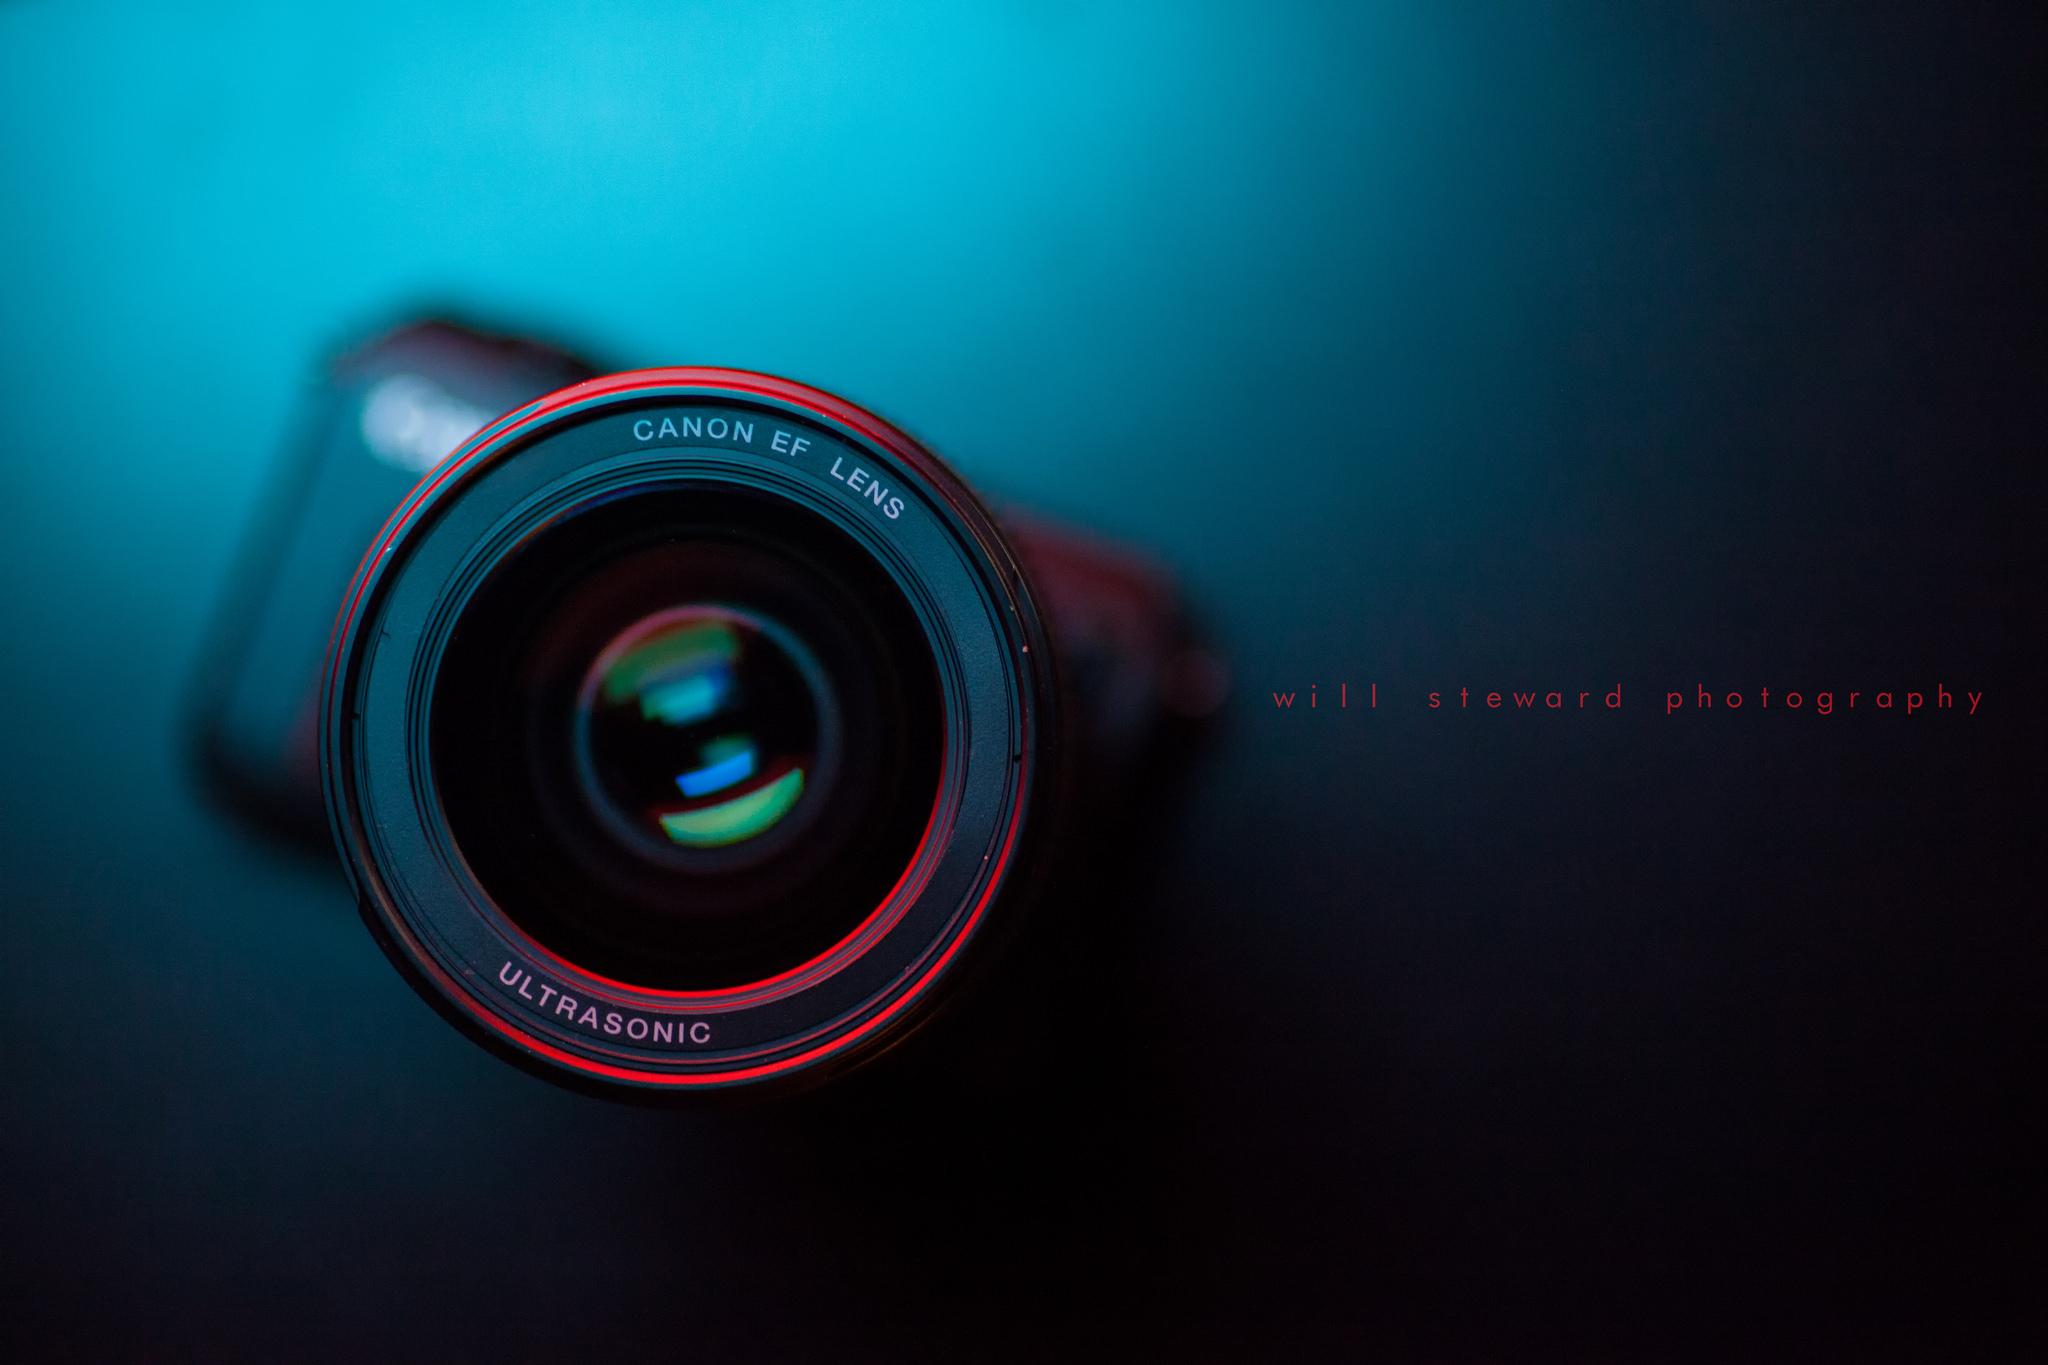 Hd wallpaper camera - Hi Tech Canon Ef Lens Ultrasonic Background Camera Hd